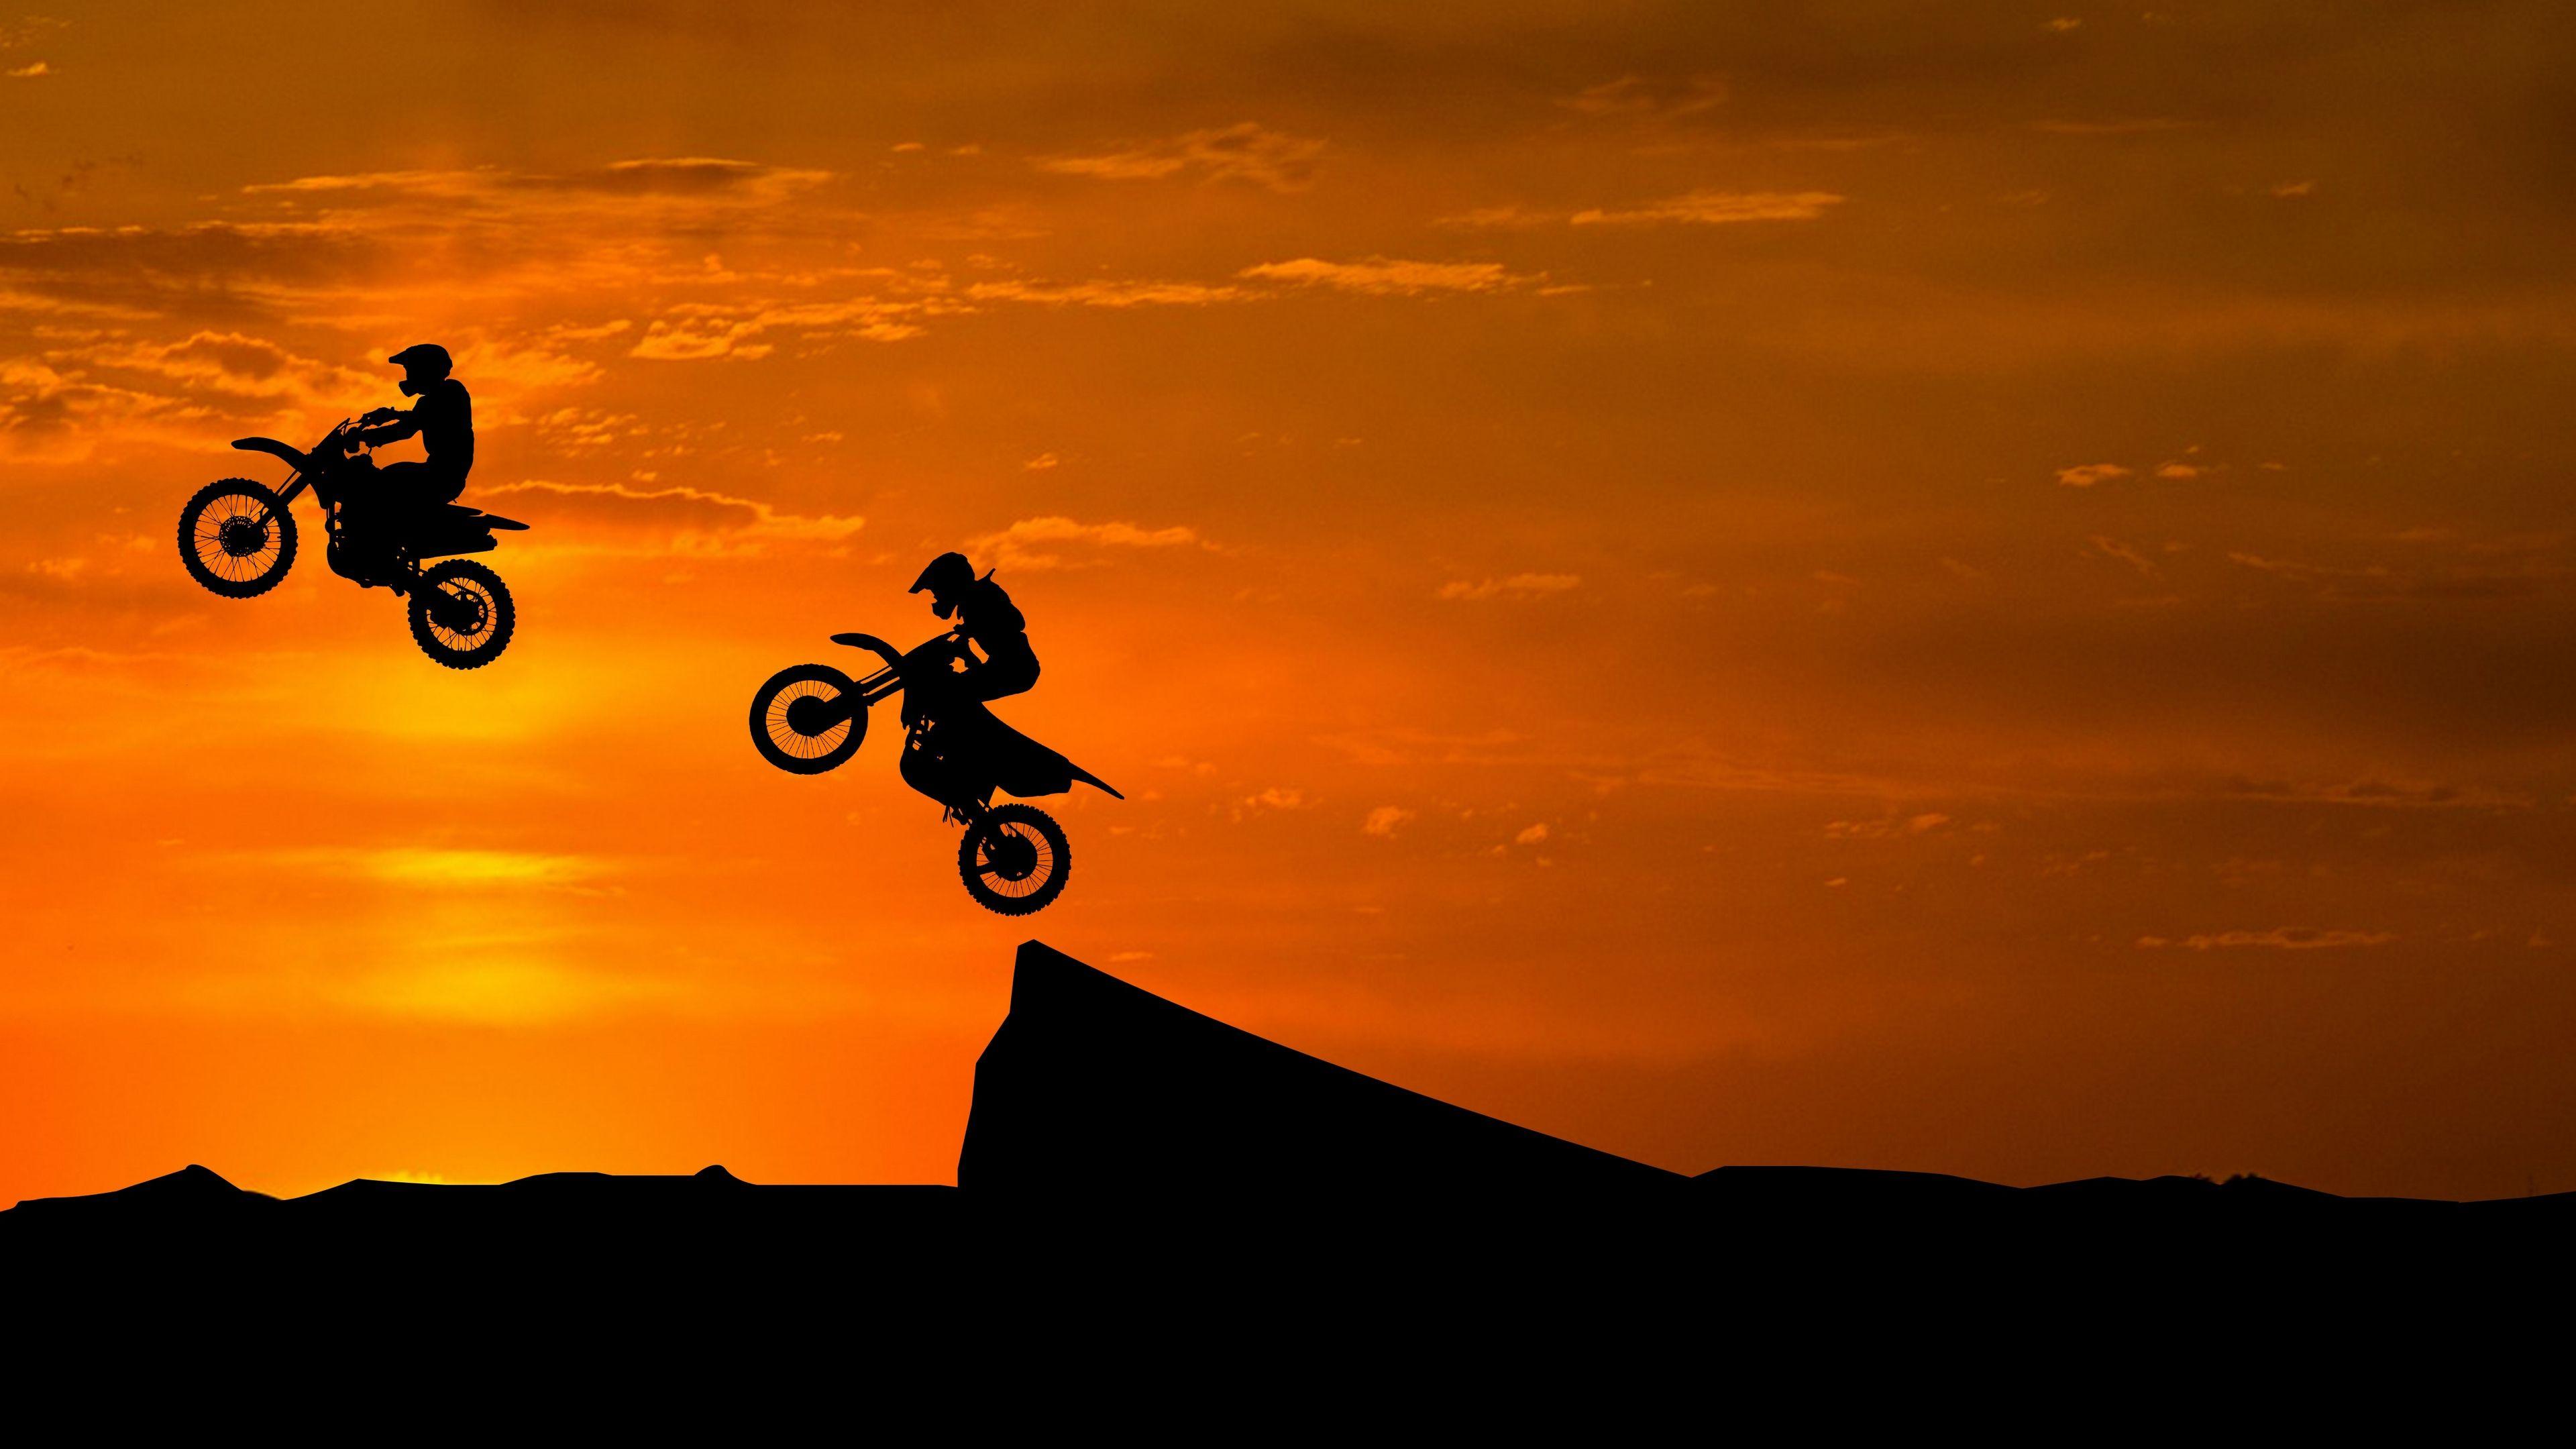 Motorcyclist Silhouettes Trick Hill 4k 4k Hd Wallpapers Sunset Silhouette Motocross Stunt Bike